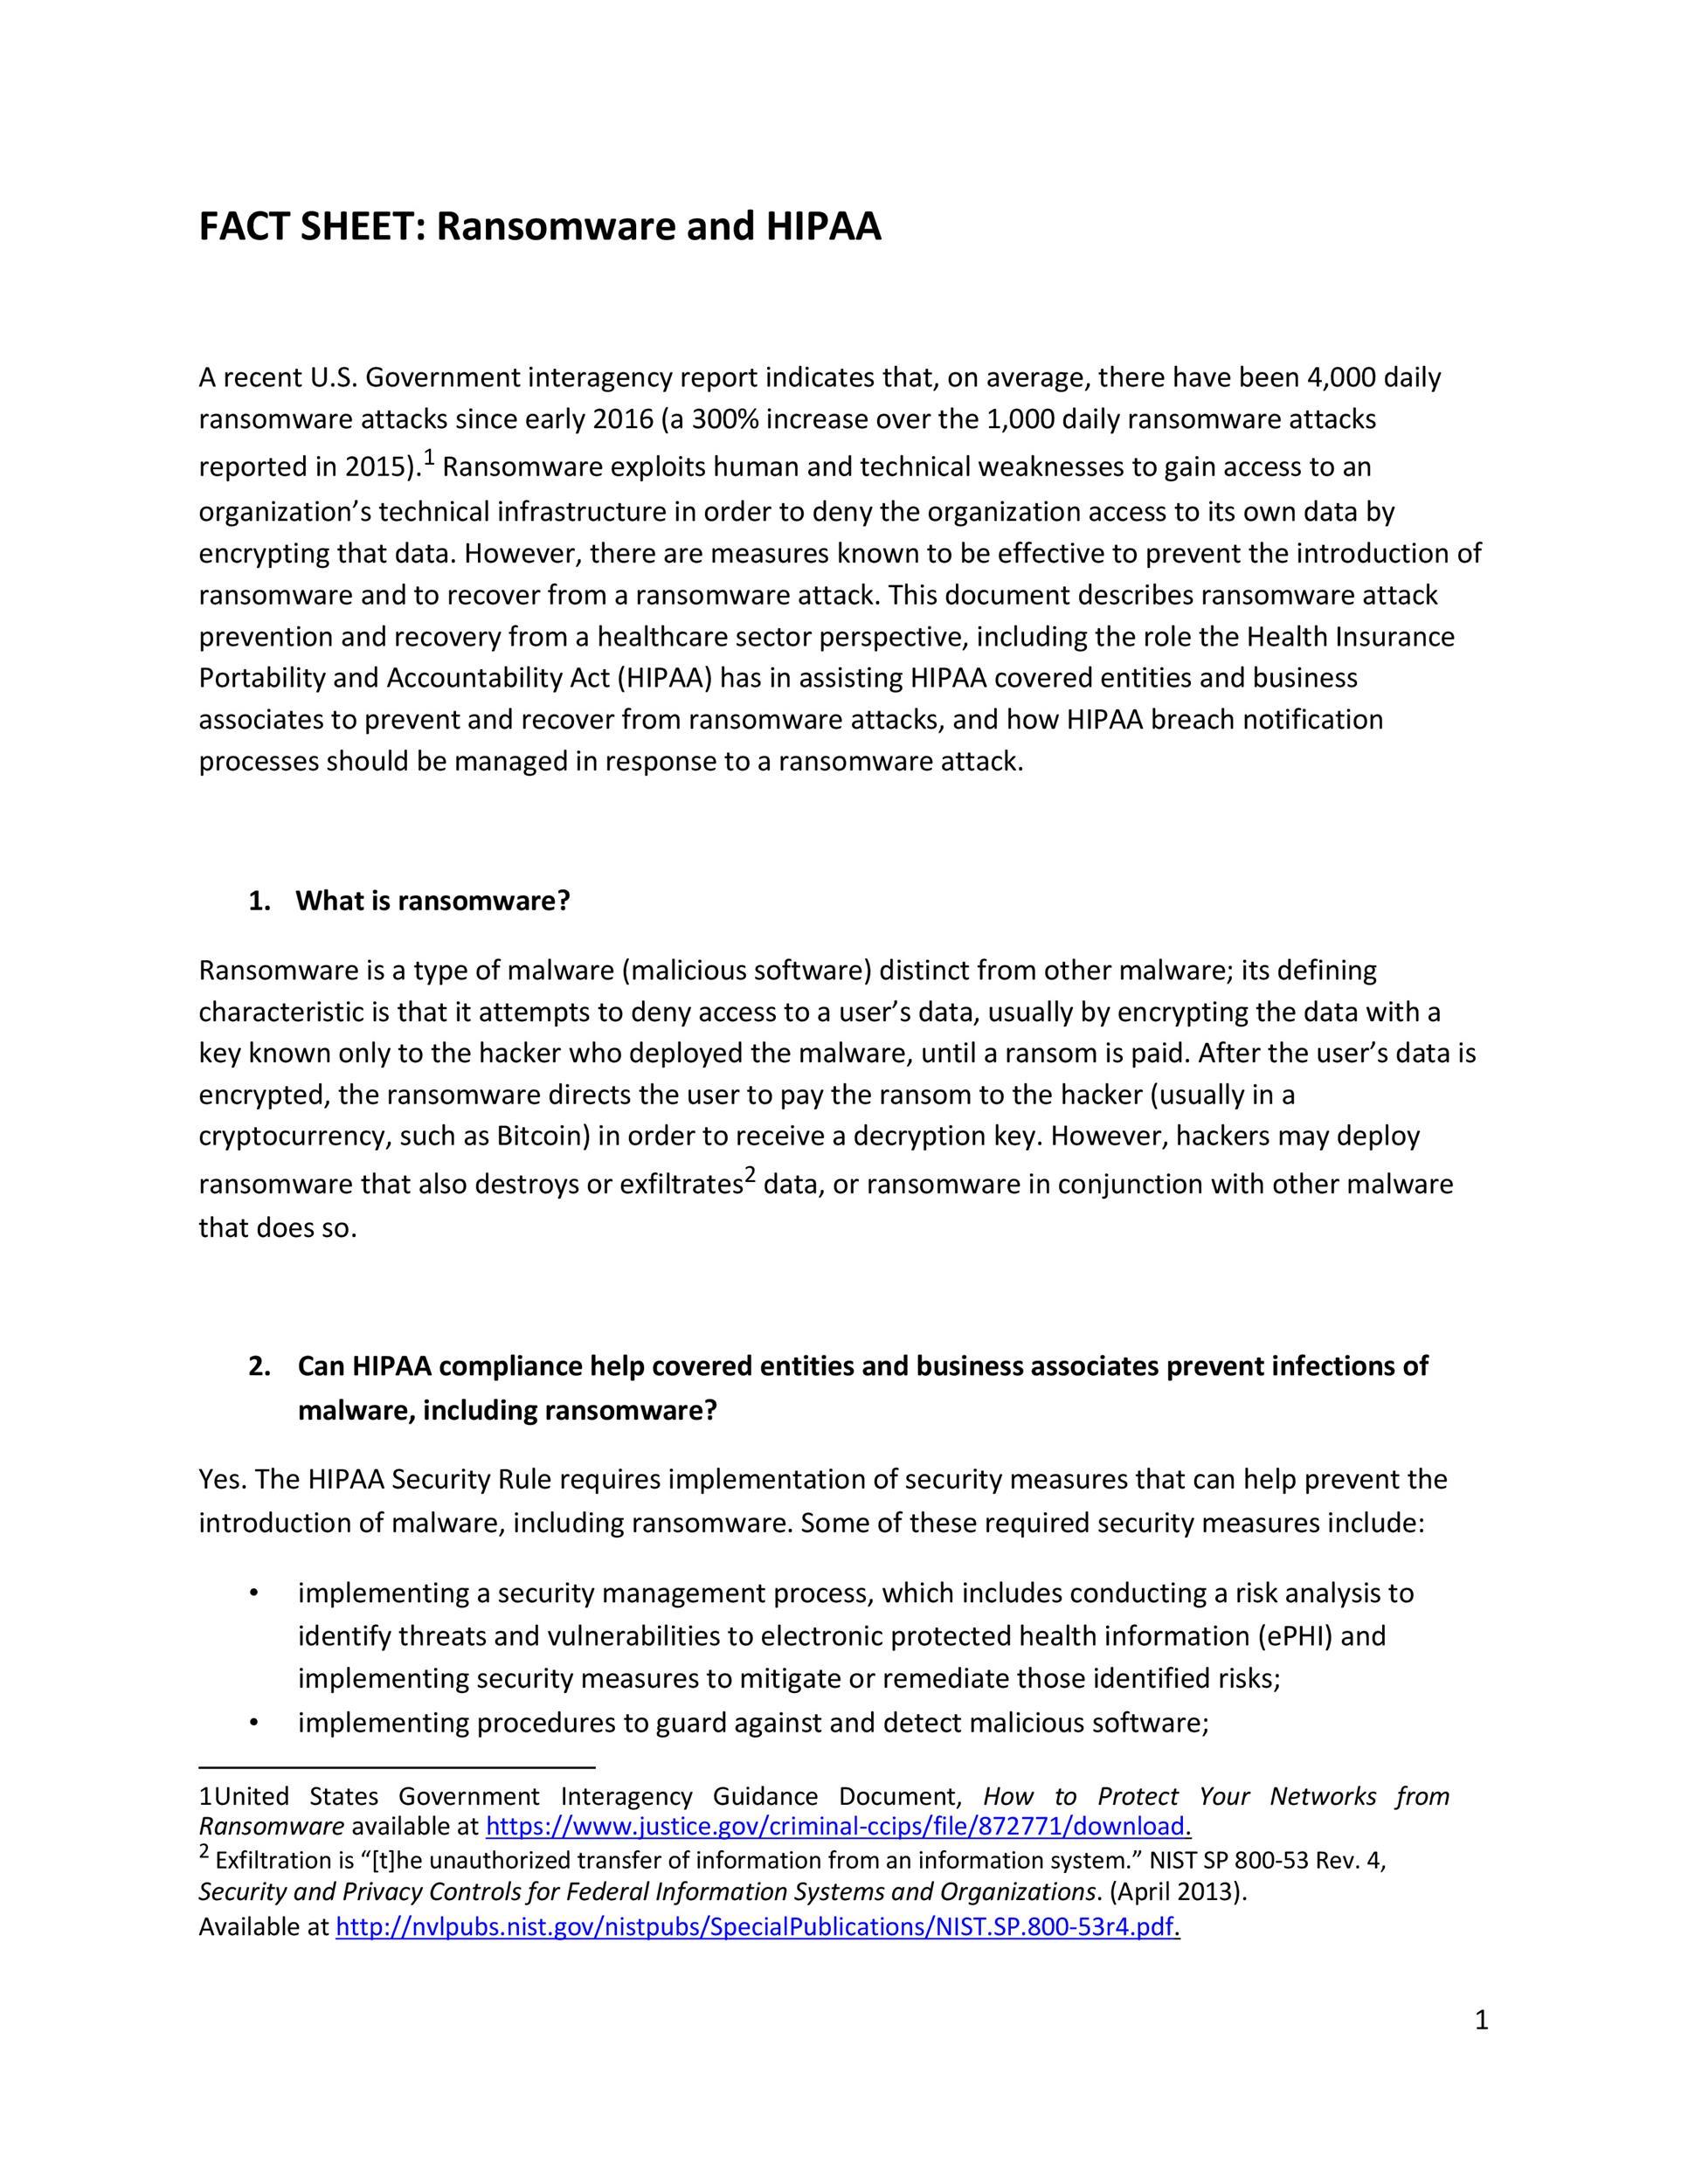 Free Fact sheet Template 12